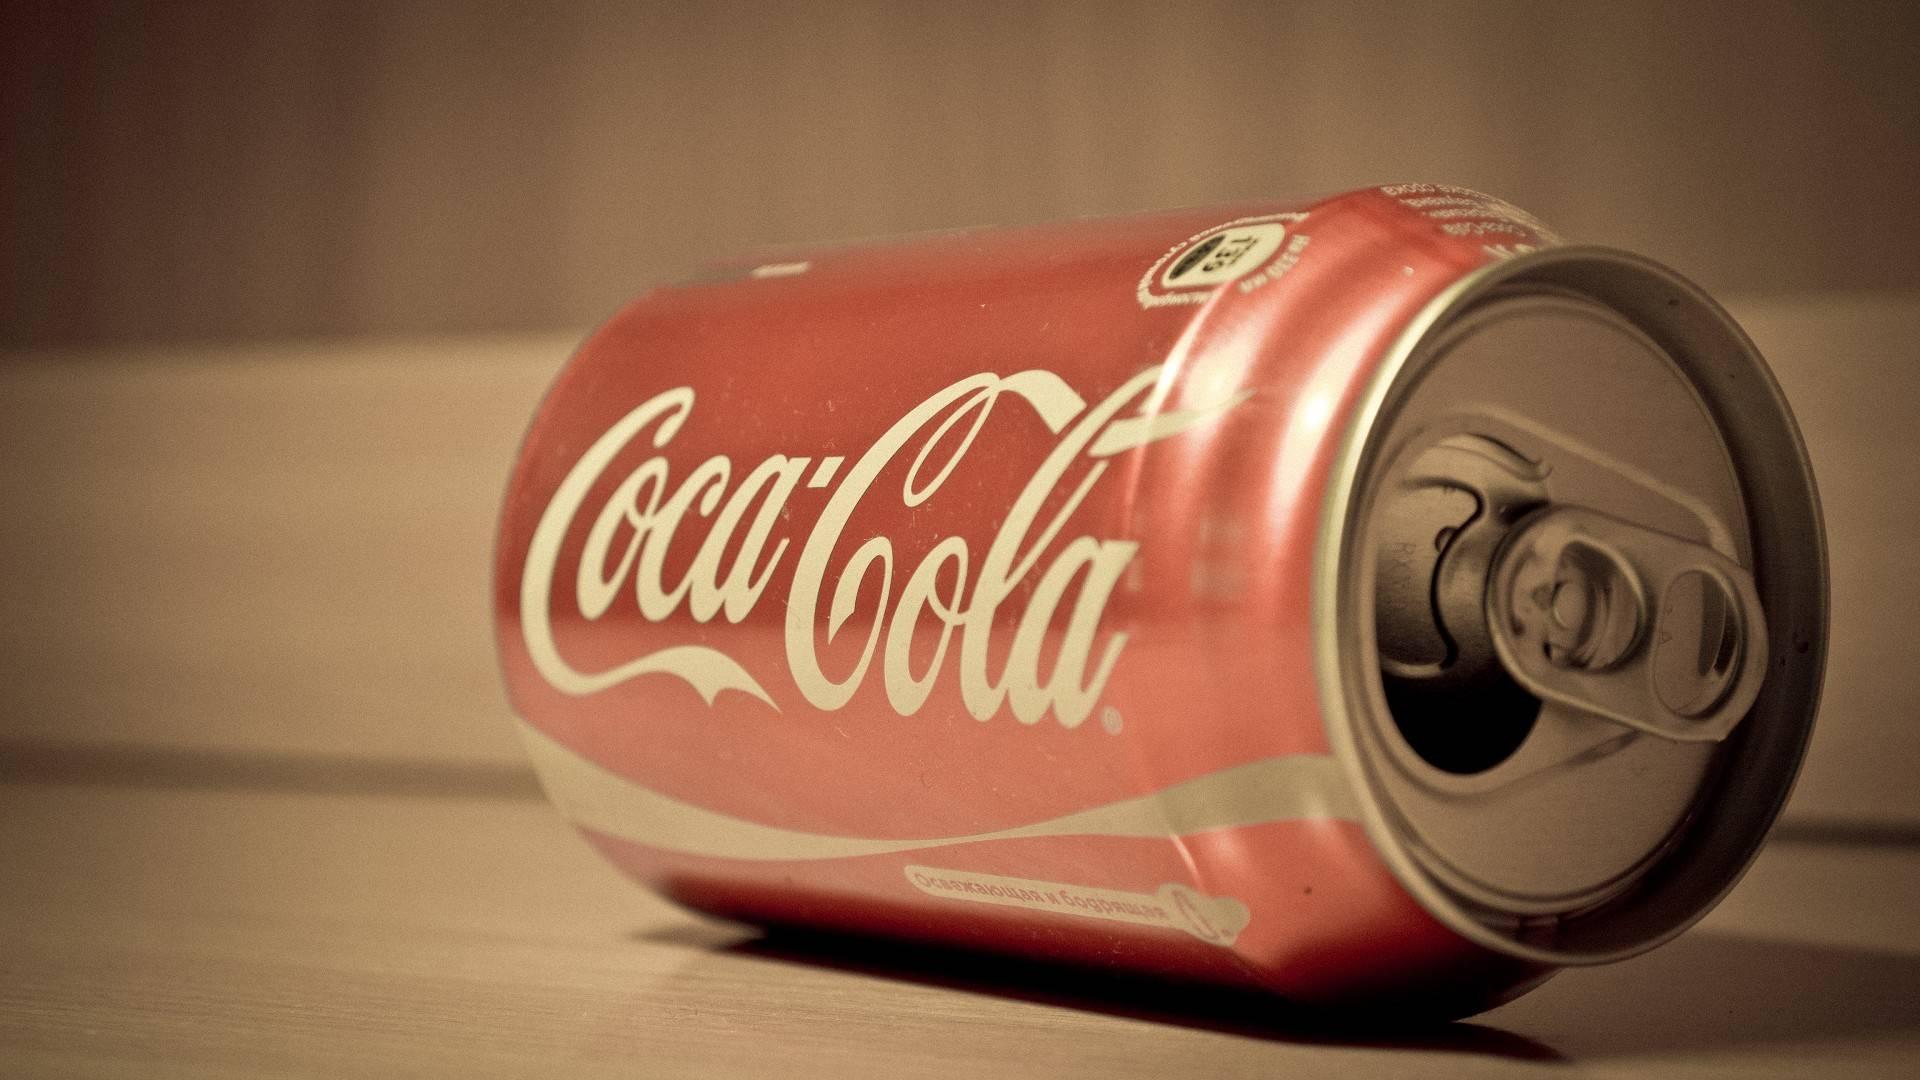 Awesome Coke Wallpaper Image